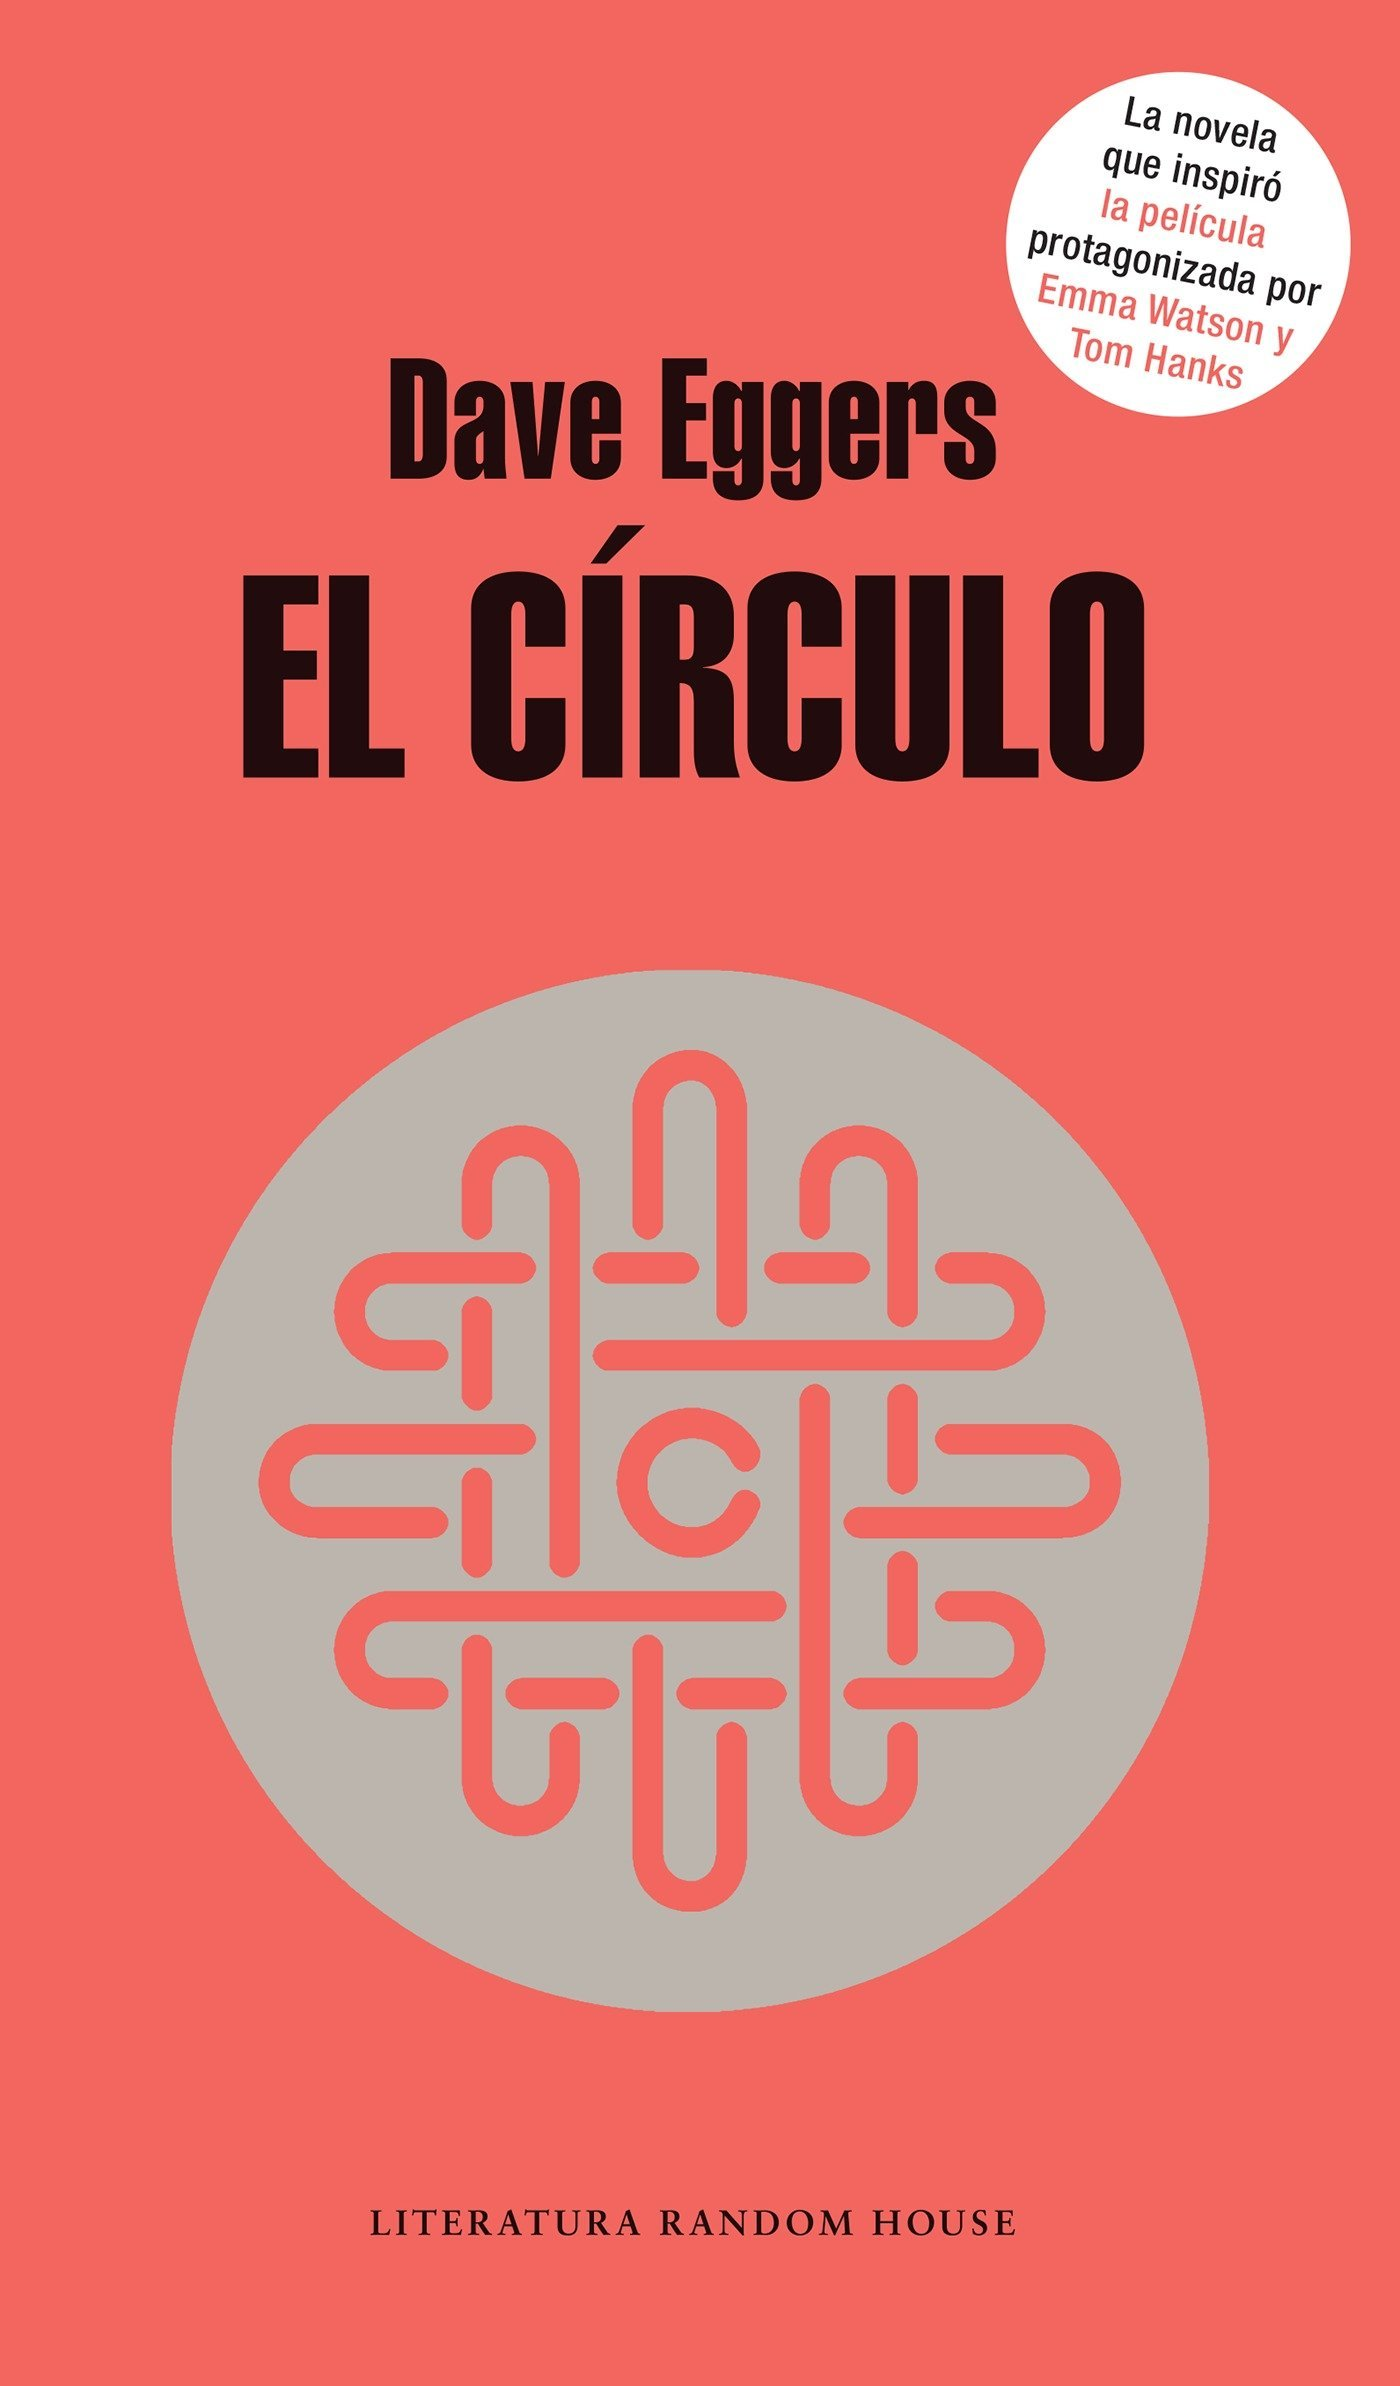 El círculo / The Circle (Spanish Edition): Dave Eggers: 9781945540622: Amazon.com: Books